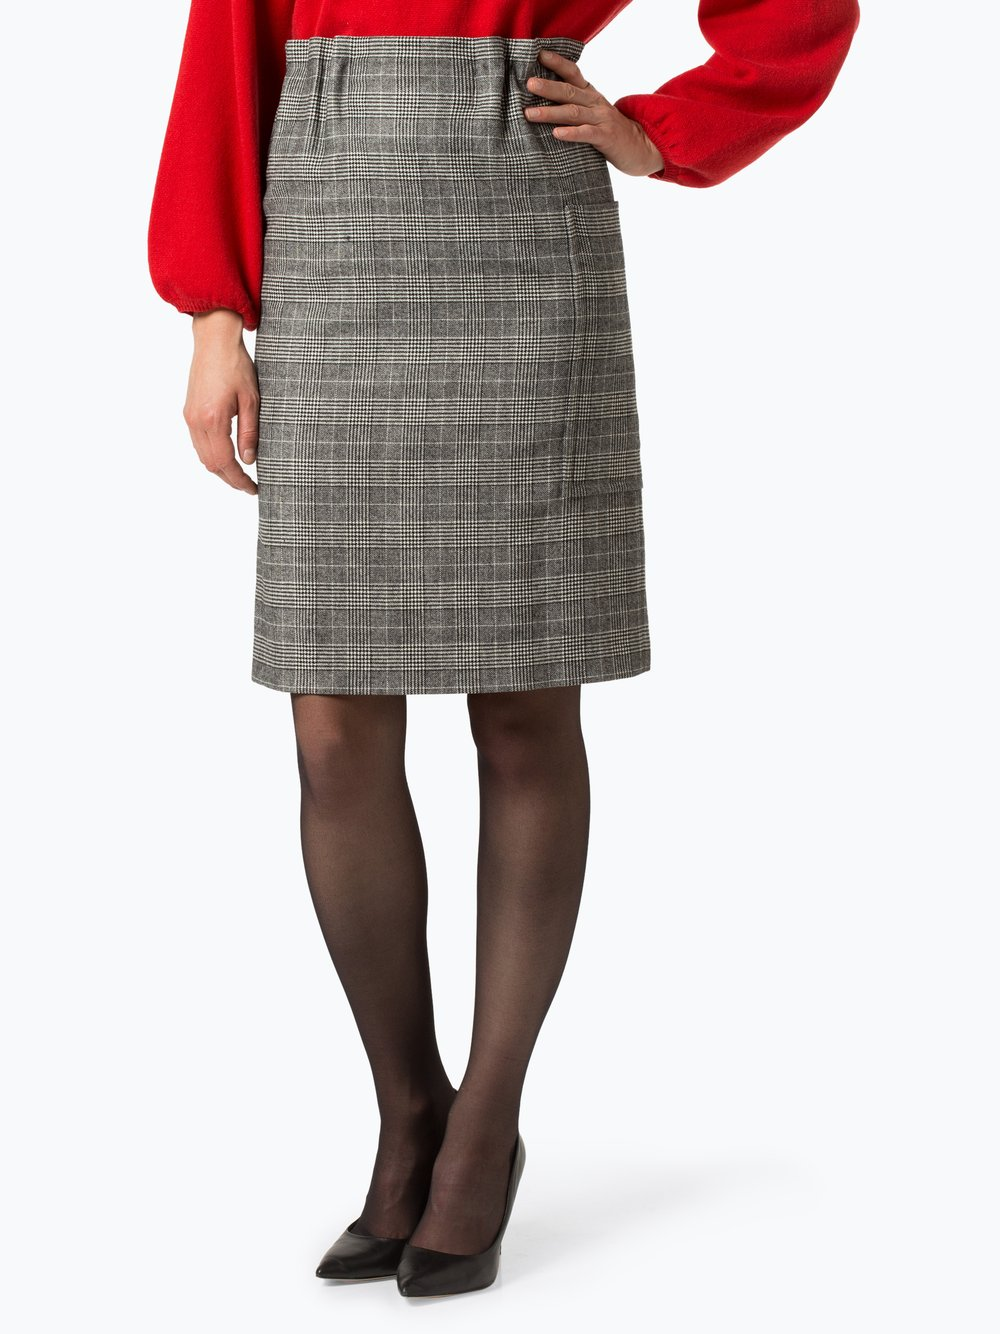 new product 49dc3 62763 Drykorn Damen Rock - Alani online kaufen   PEEK-UND ...